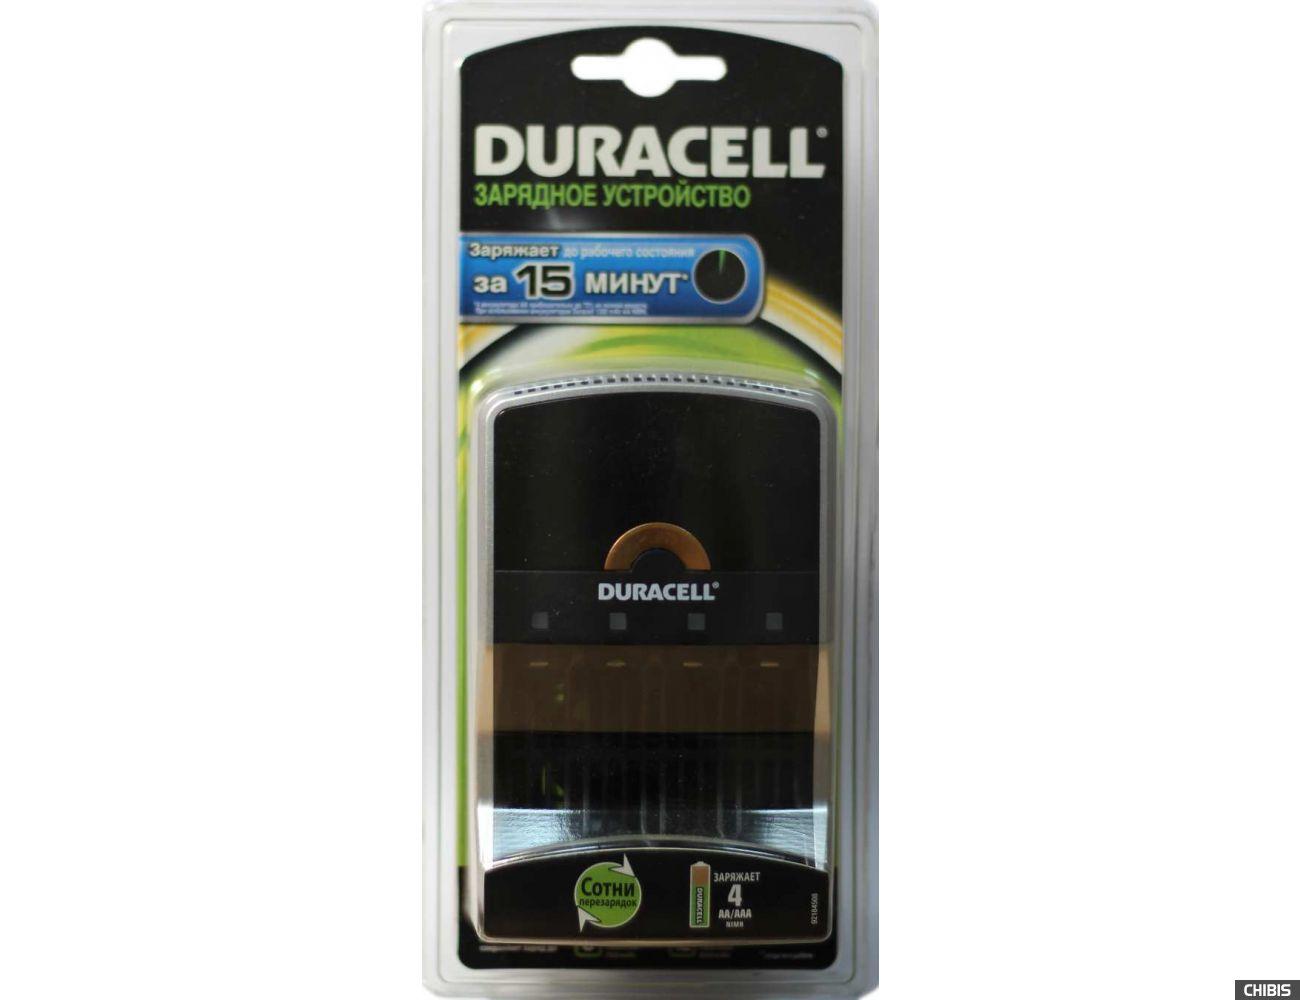 Зарядное устройство АА и ААА Duracell CEF15